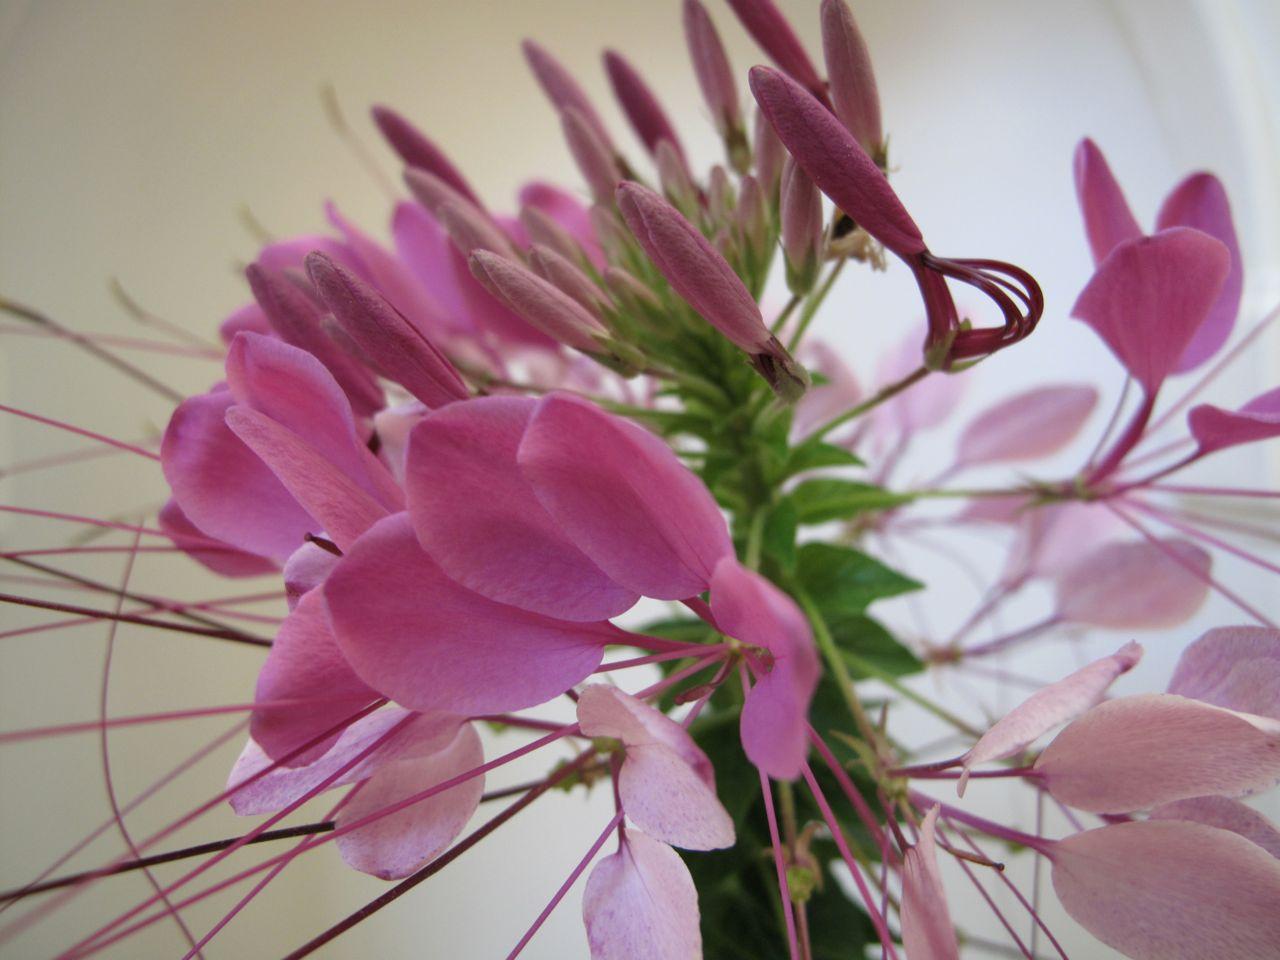 Cleome hassleriana Spider Flower